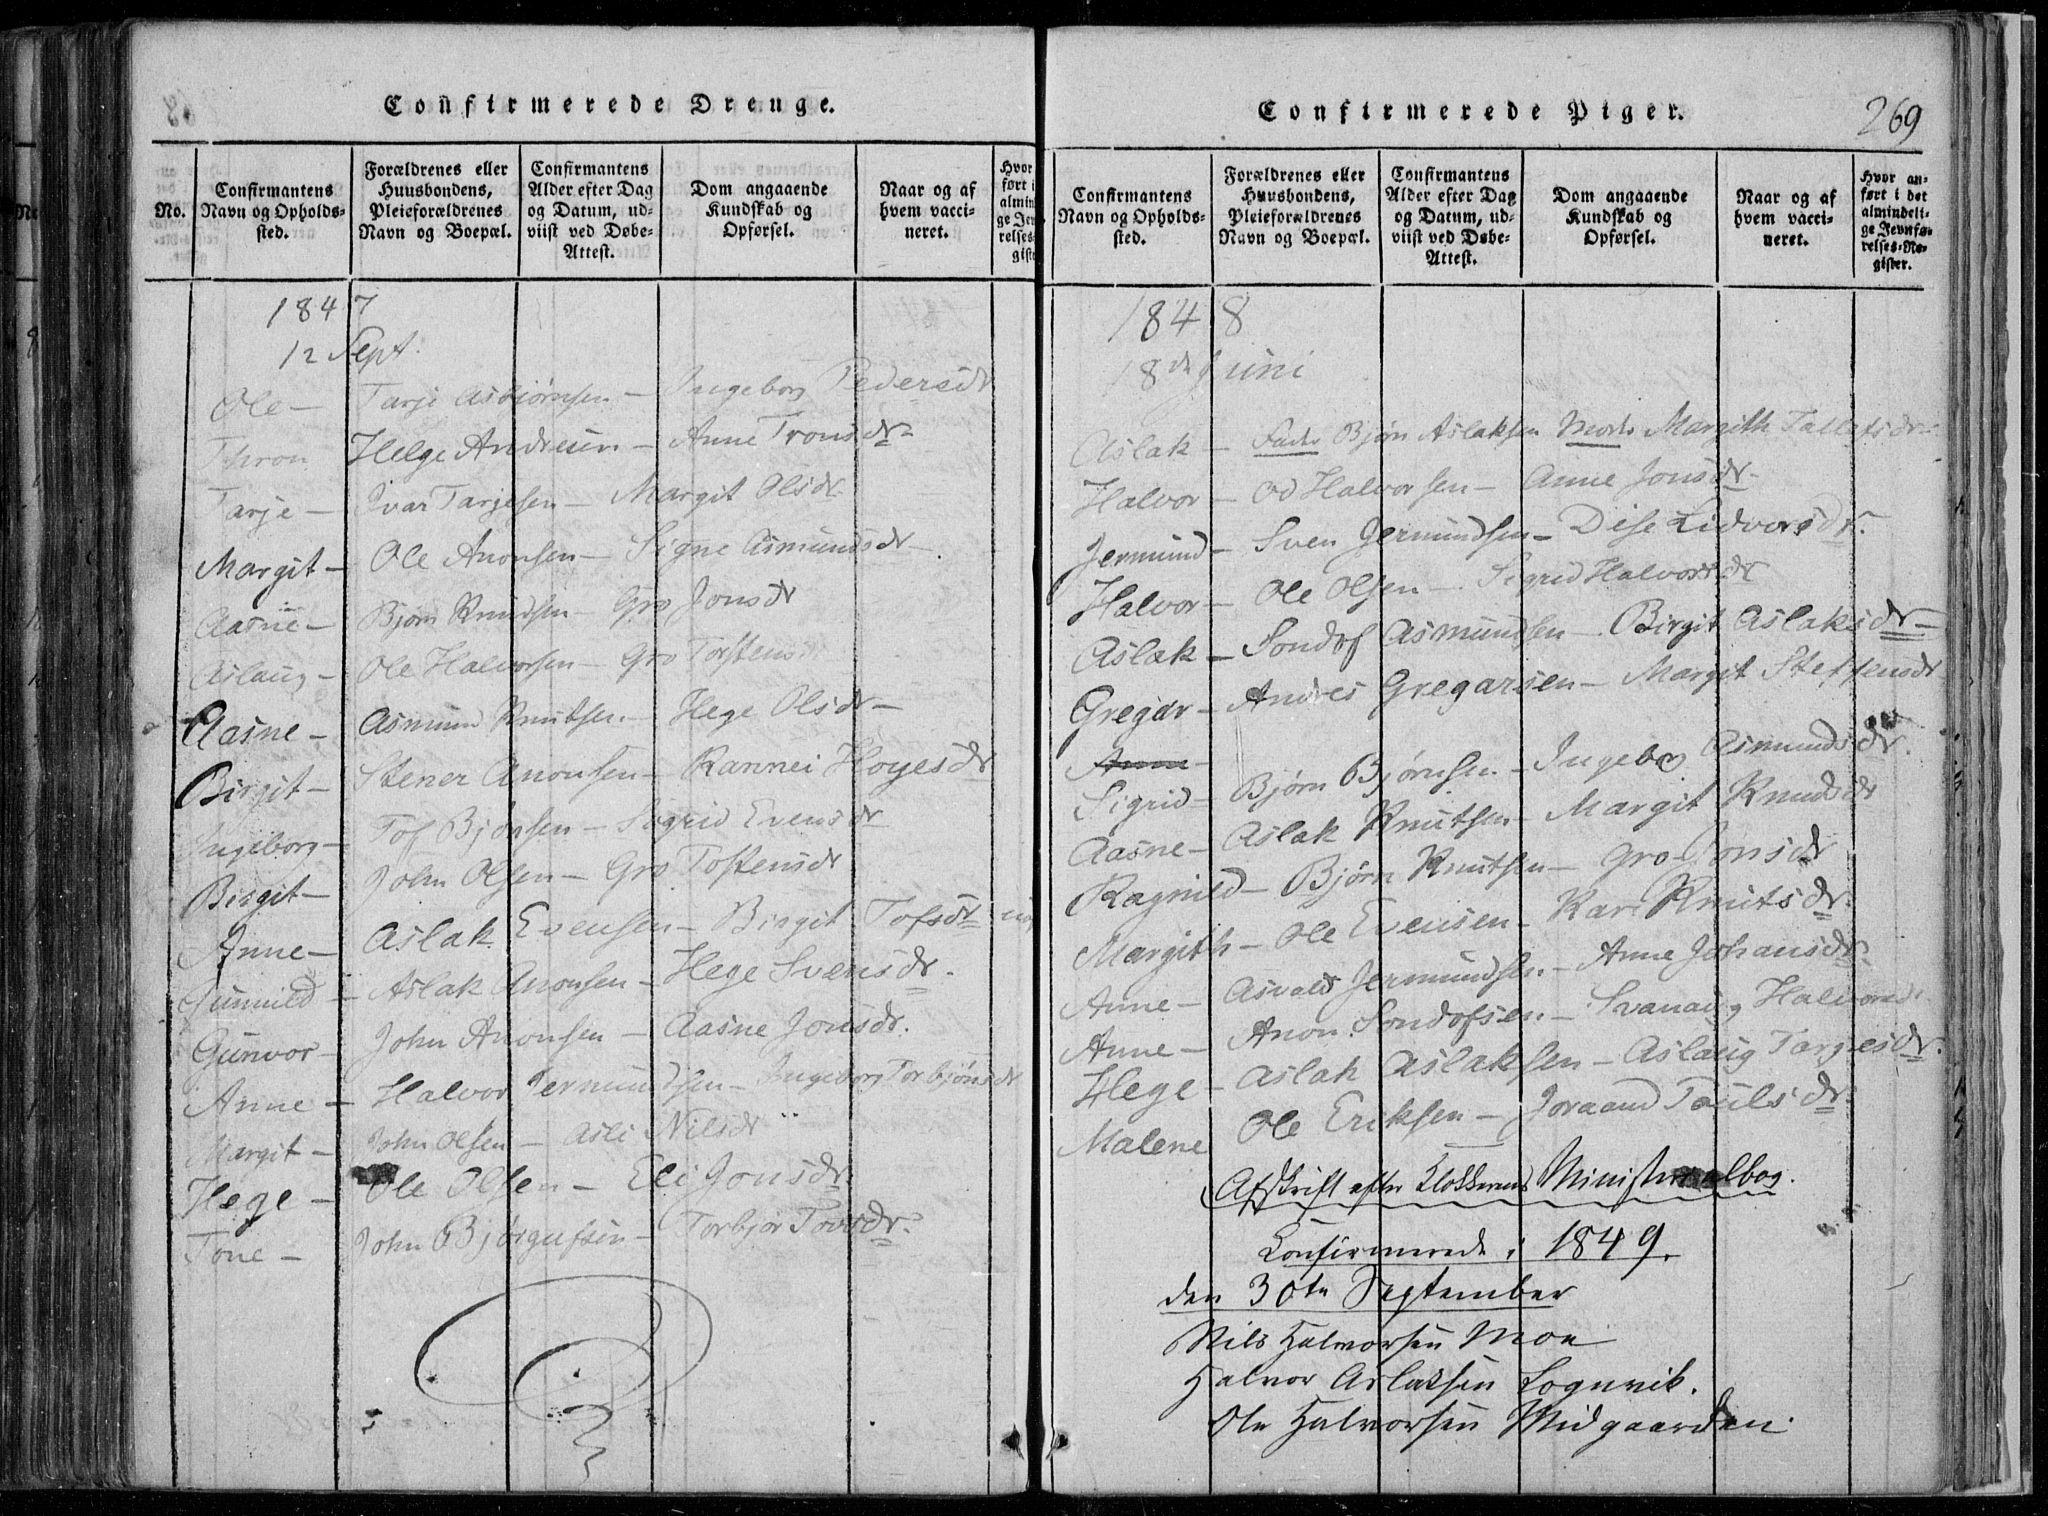 SAKO, Rauland kirkebøker, F/Fa/L0001: Ministerialbok nr. 1, 1814-1859, s. 269